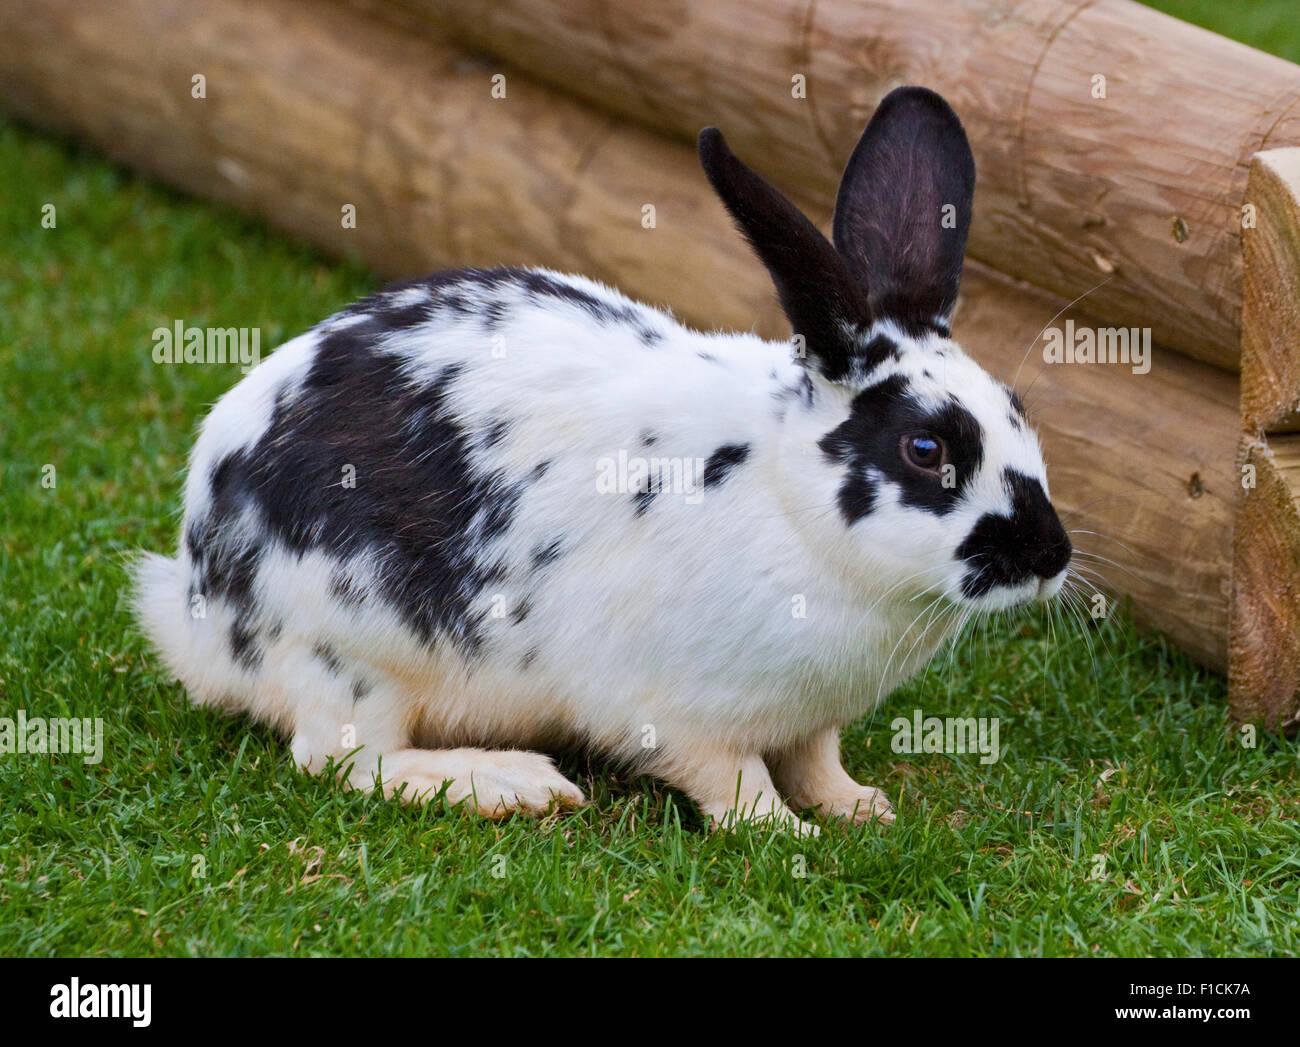 Black /& White Bunny